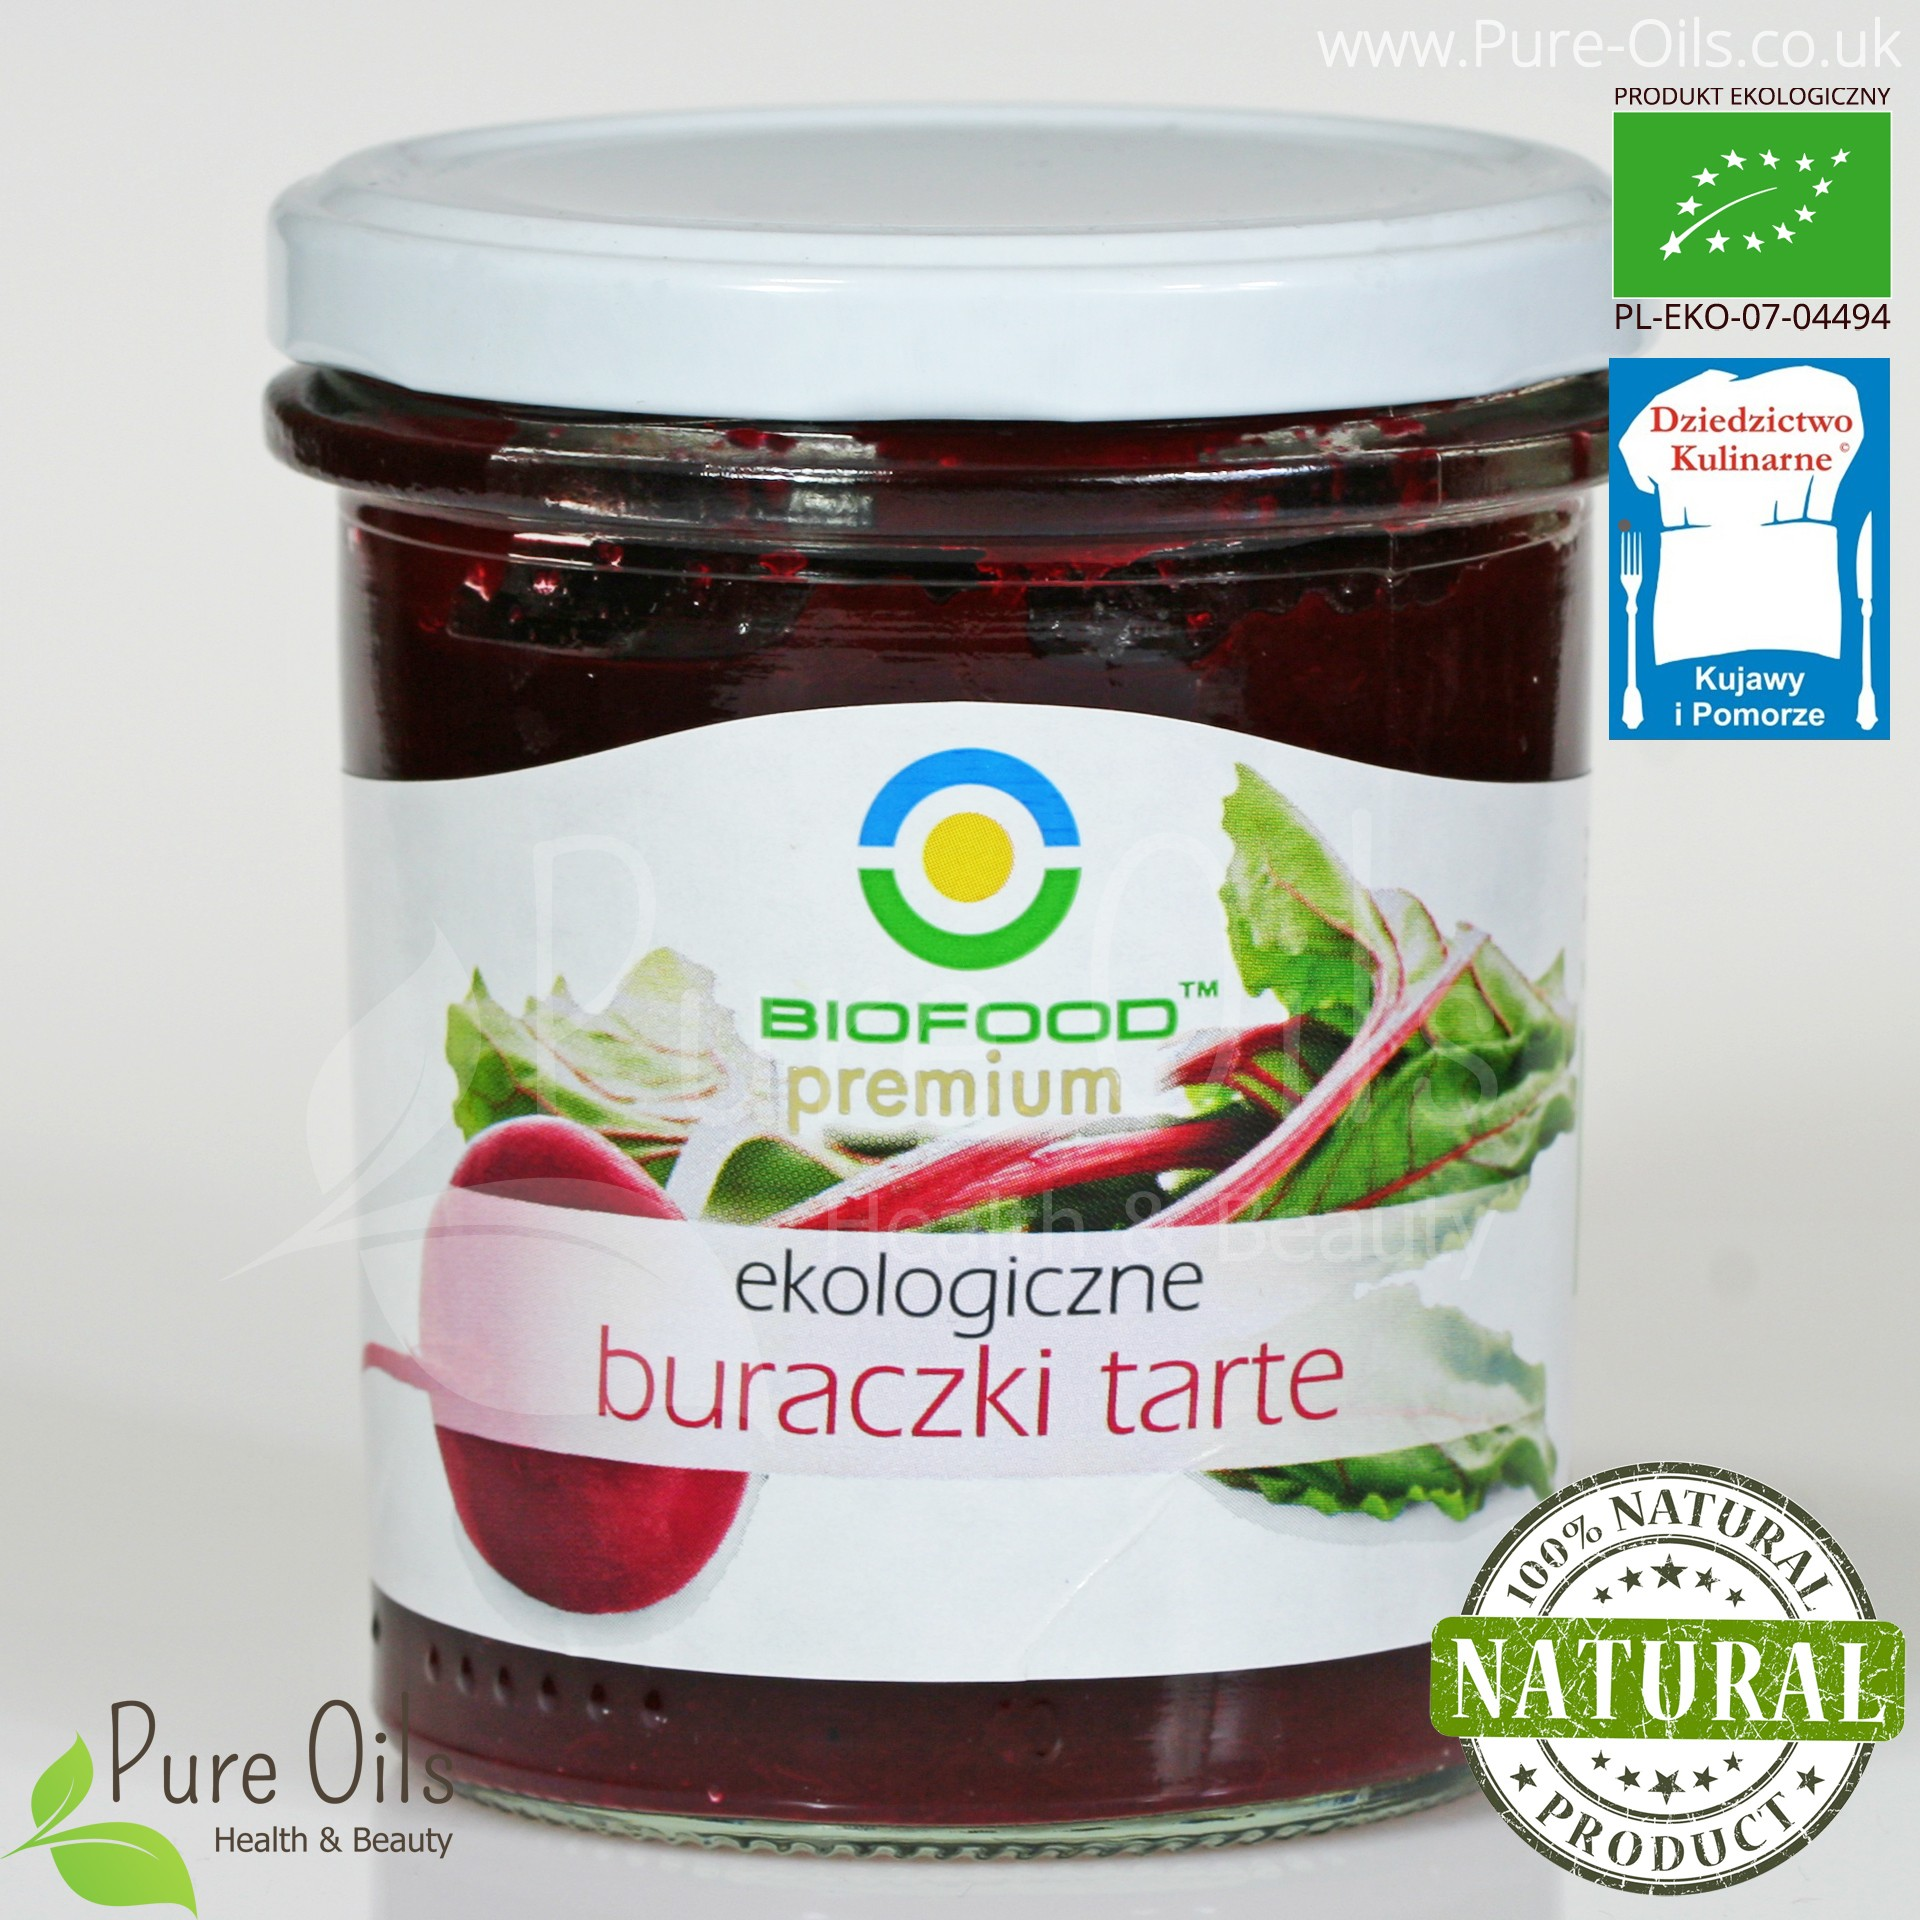 Buraczki Tarte - Ekologiczne, Biofood